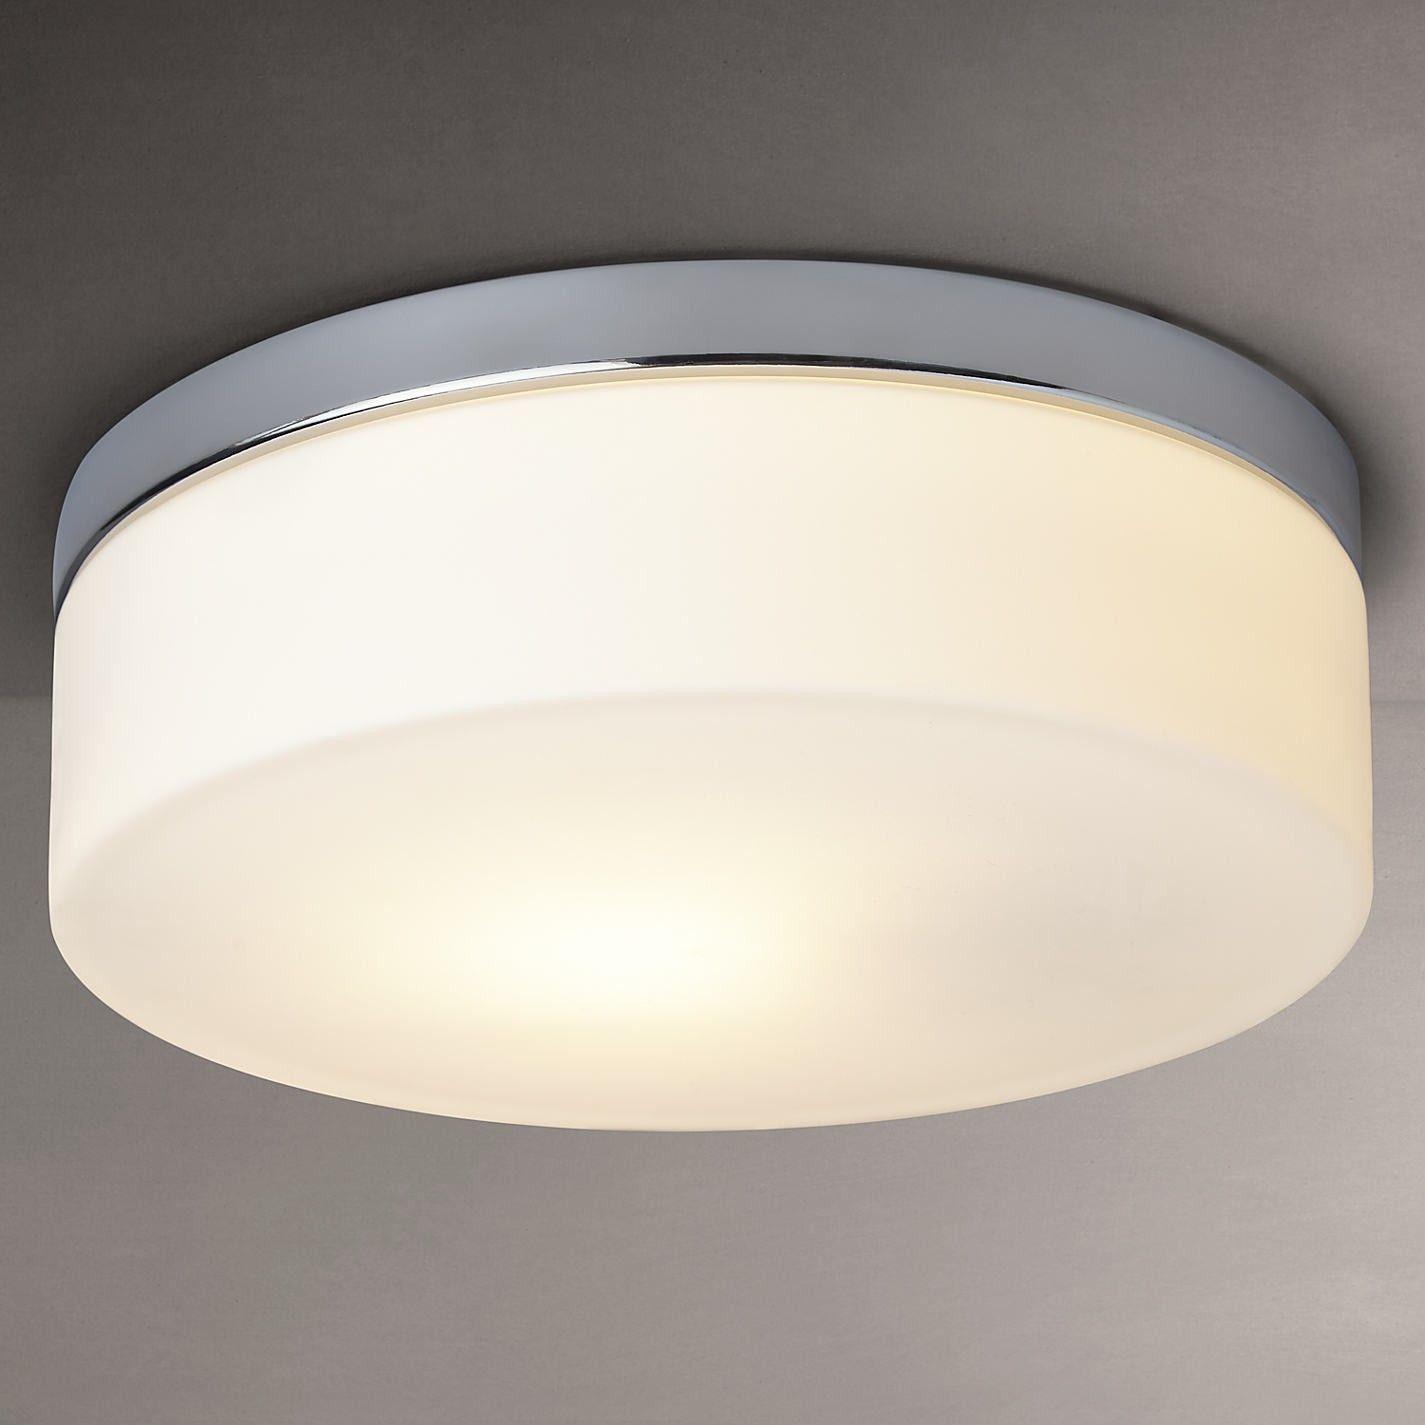 New John Lewis Bathroom Ceiling Lights Dkbzaweb Com Bathroom Ceiling Light Ceiling Lights